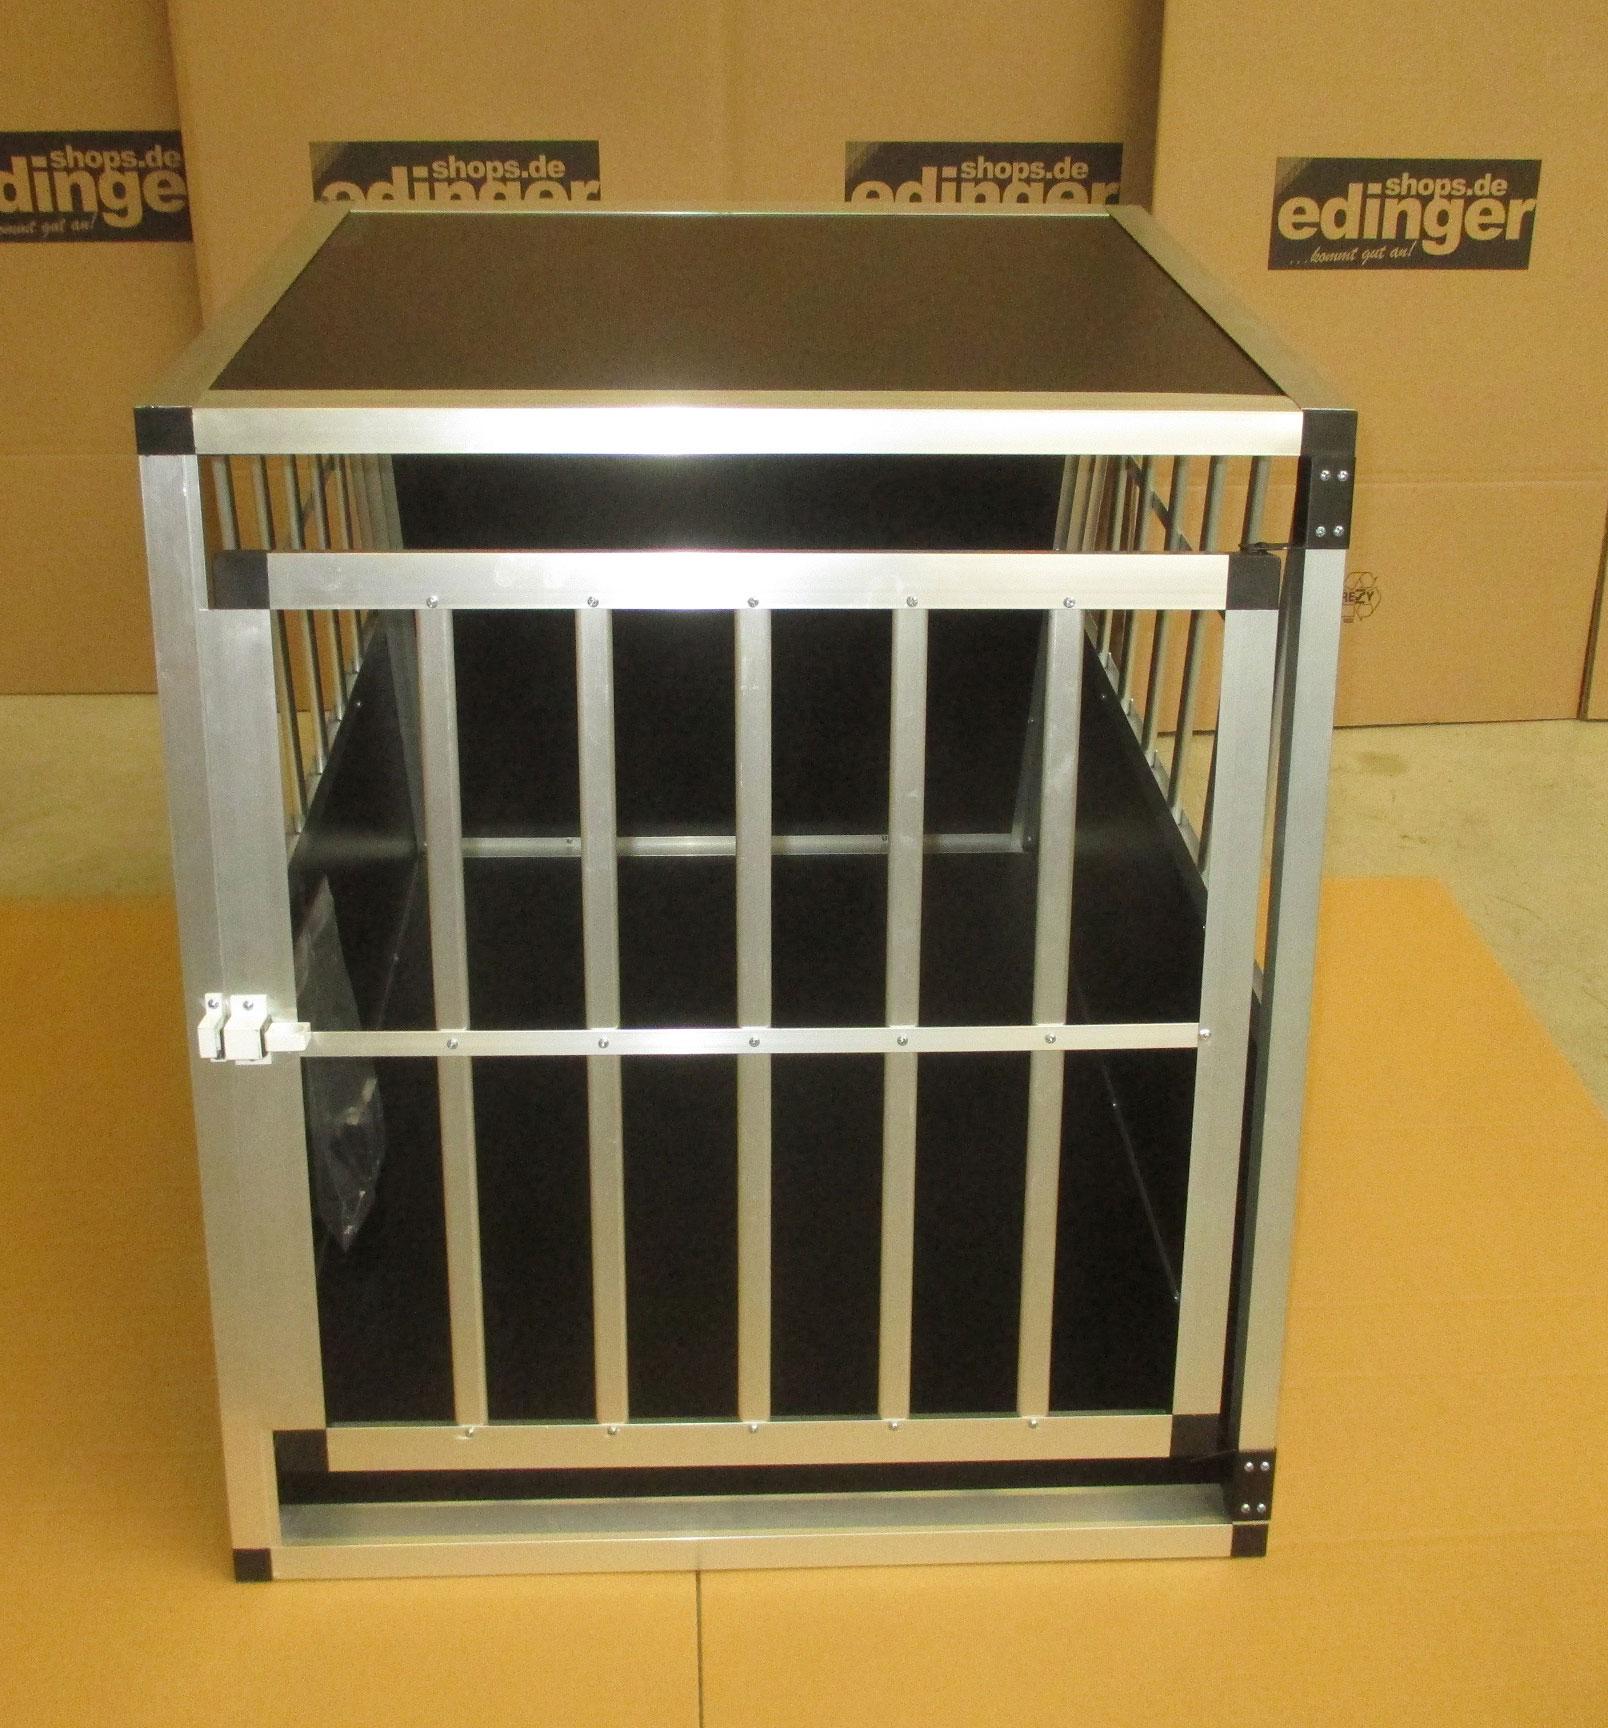 B-Ware Transportbox 90cm x 65cm x 70cm Bild 1